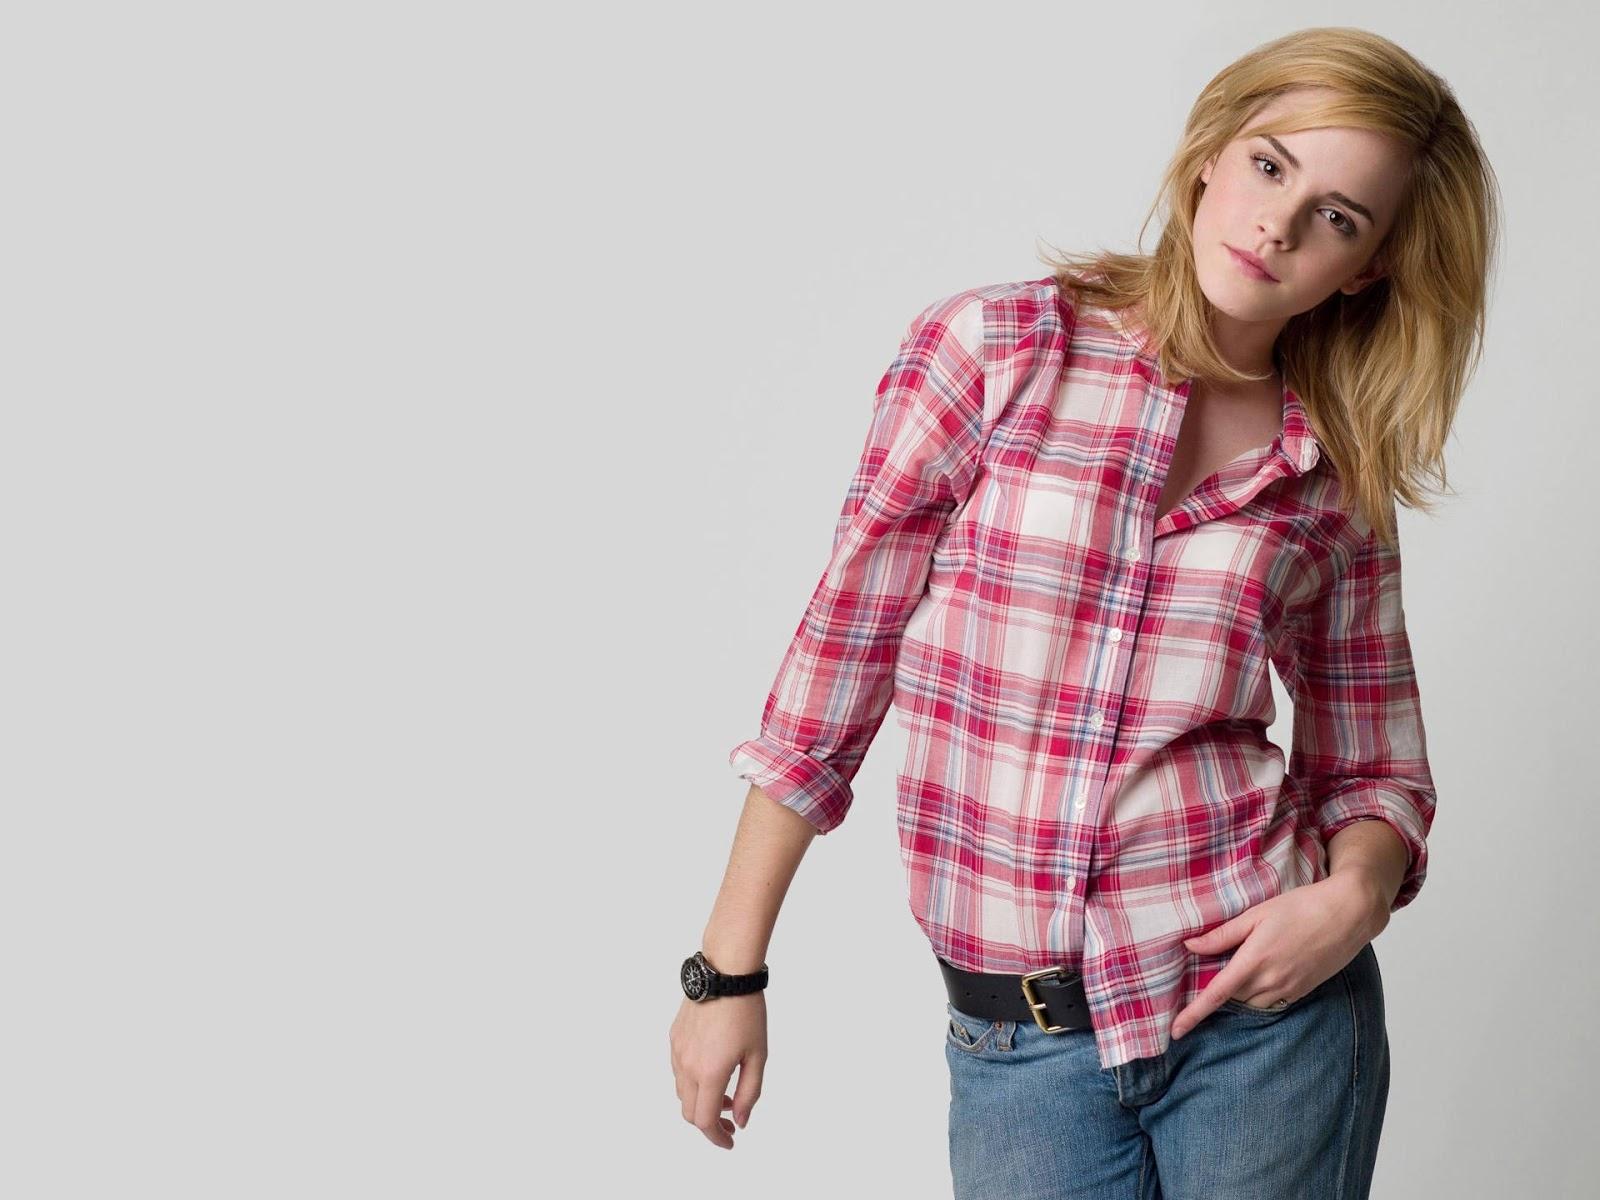 Emma Watson Photoshoot HD Image